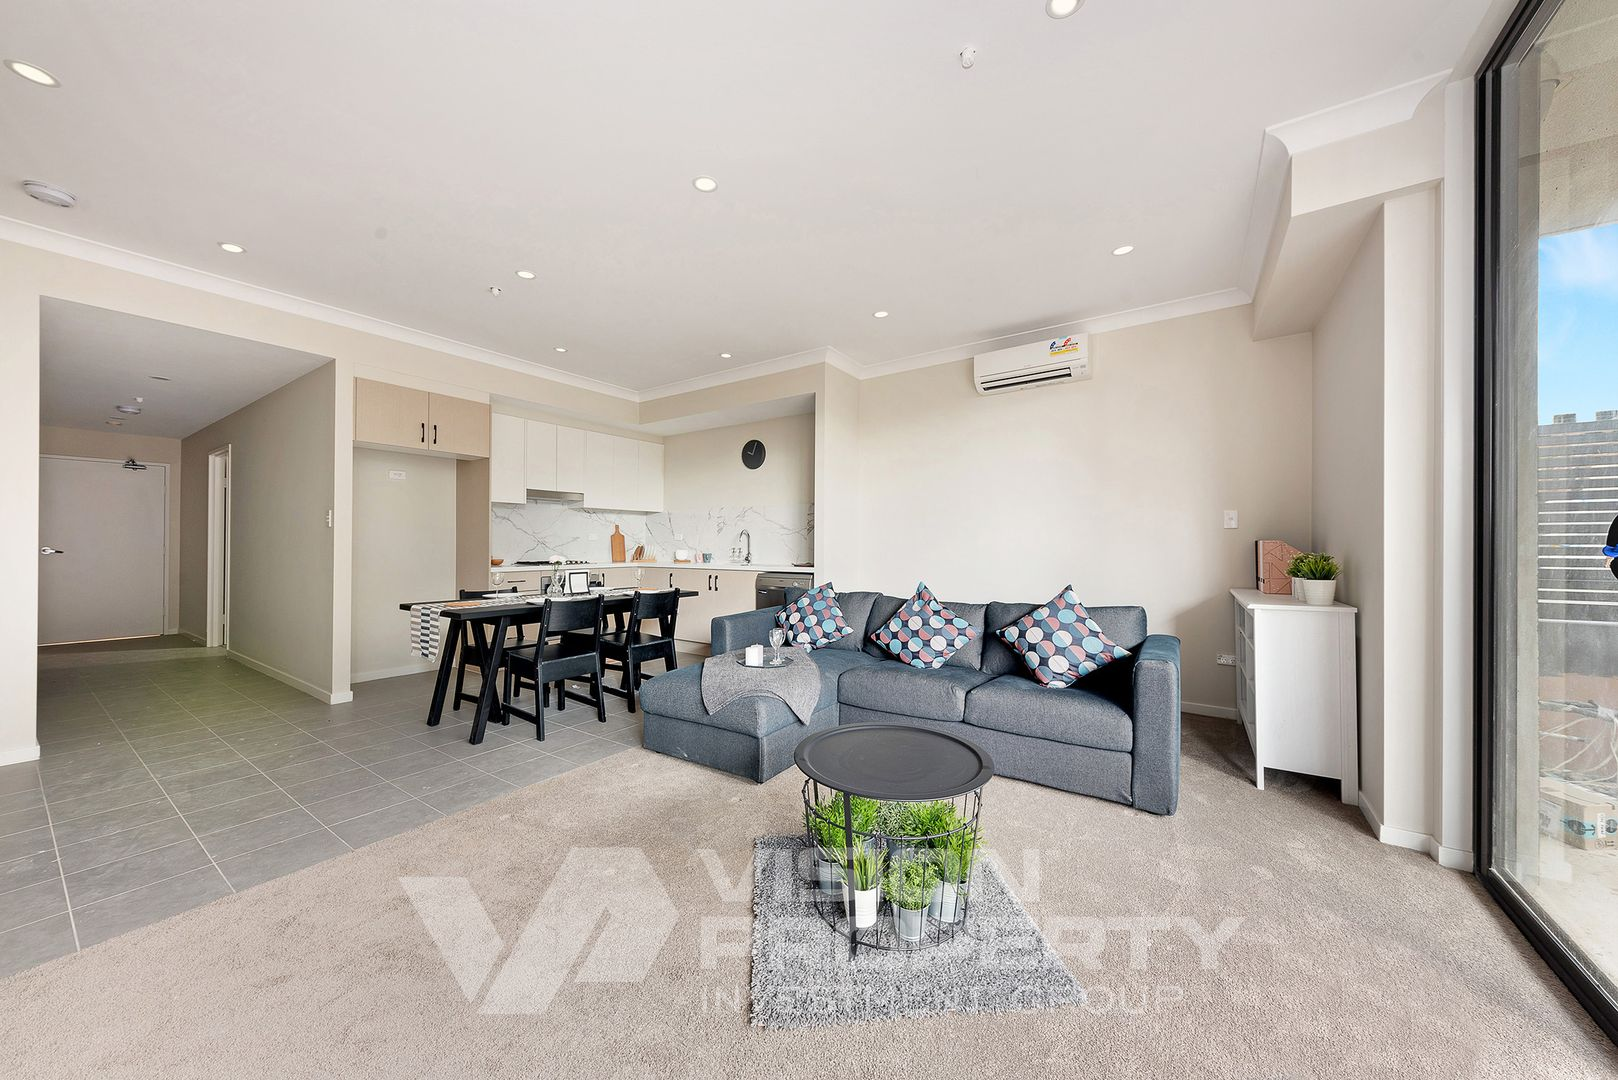 25-31 Hope Street, Penrith NSW 2750, Image 1